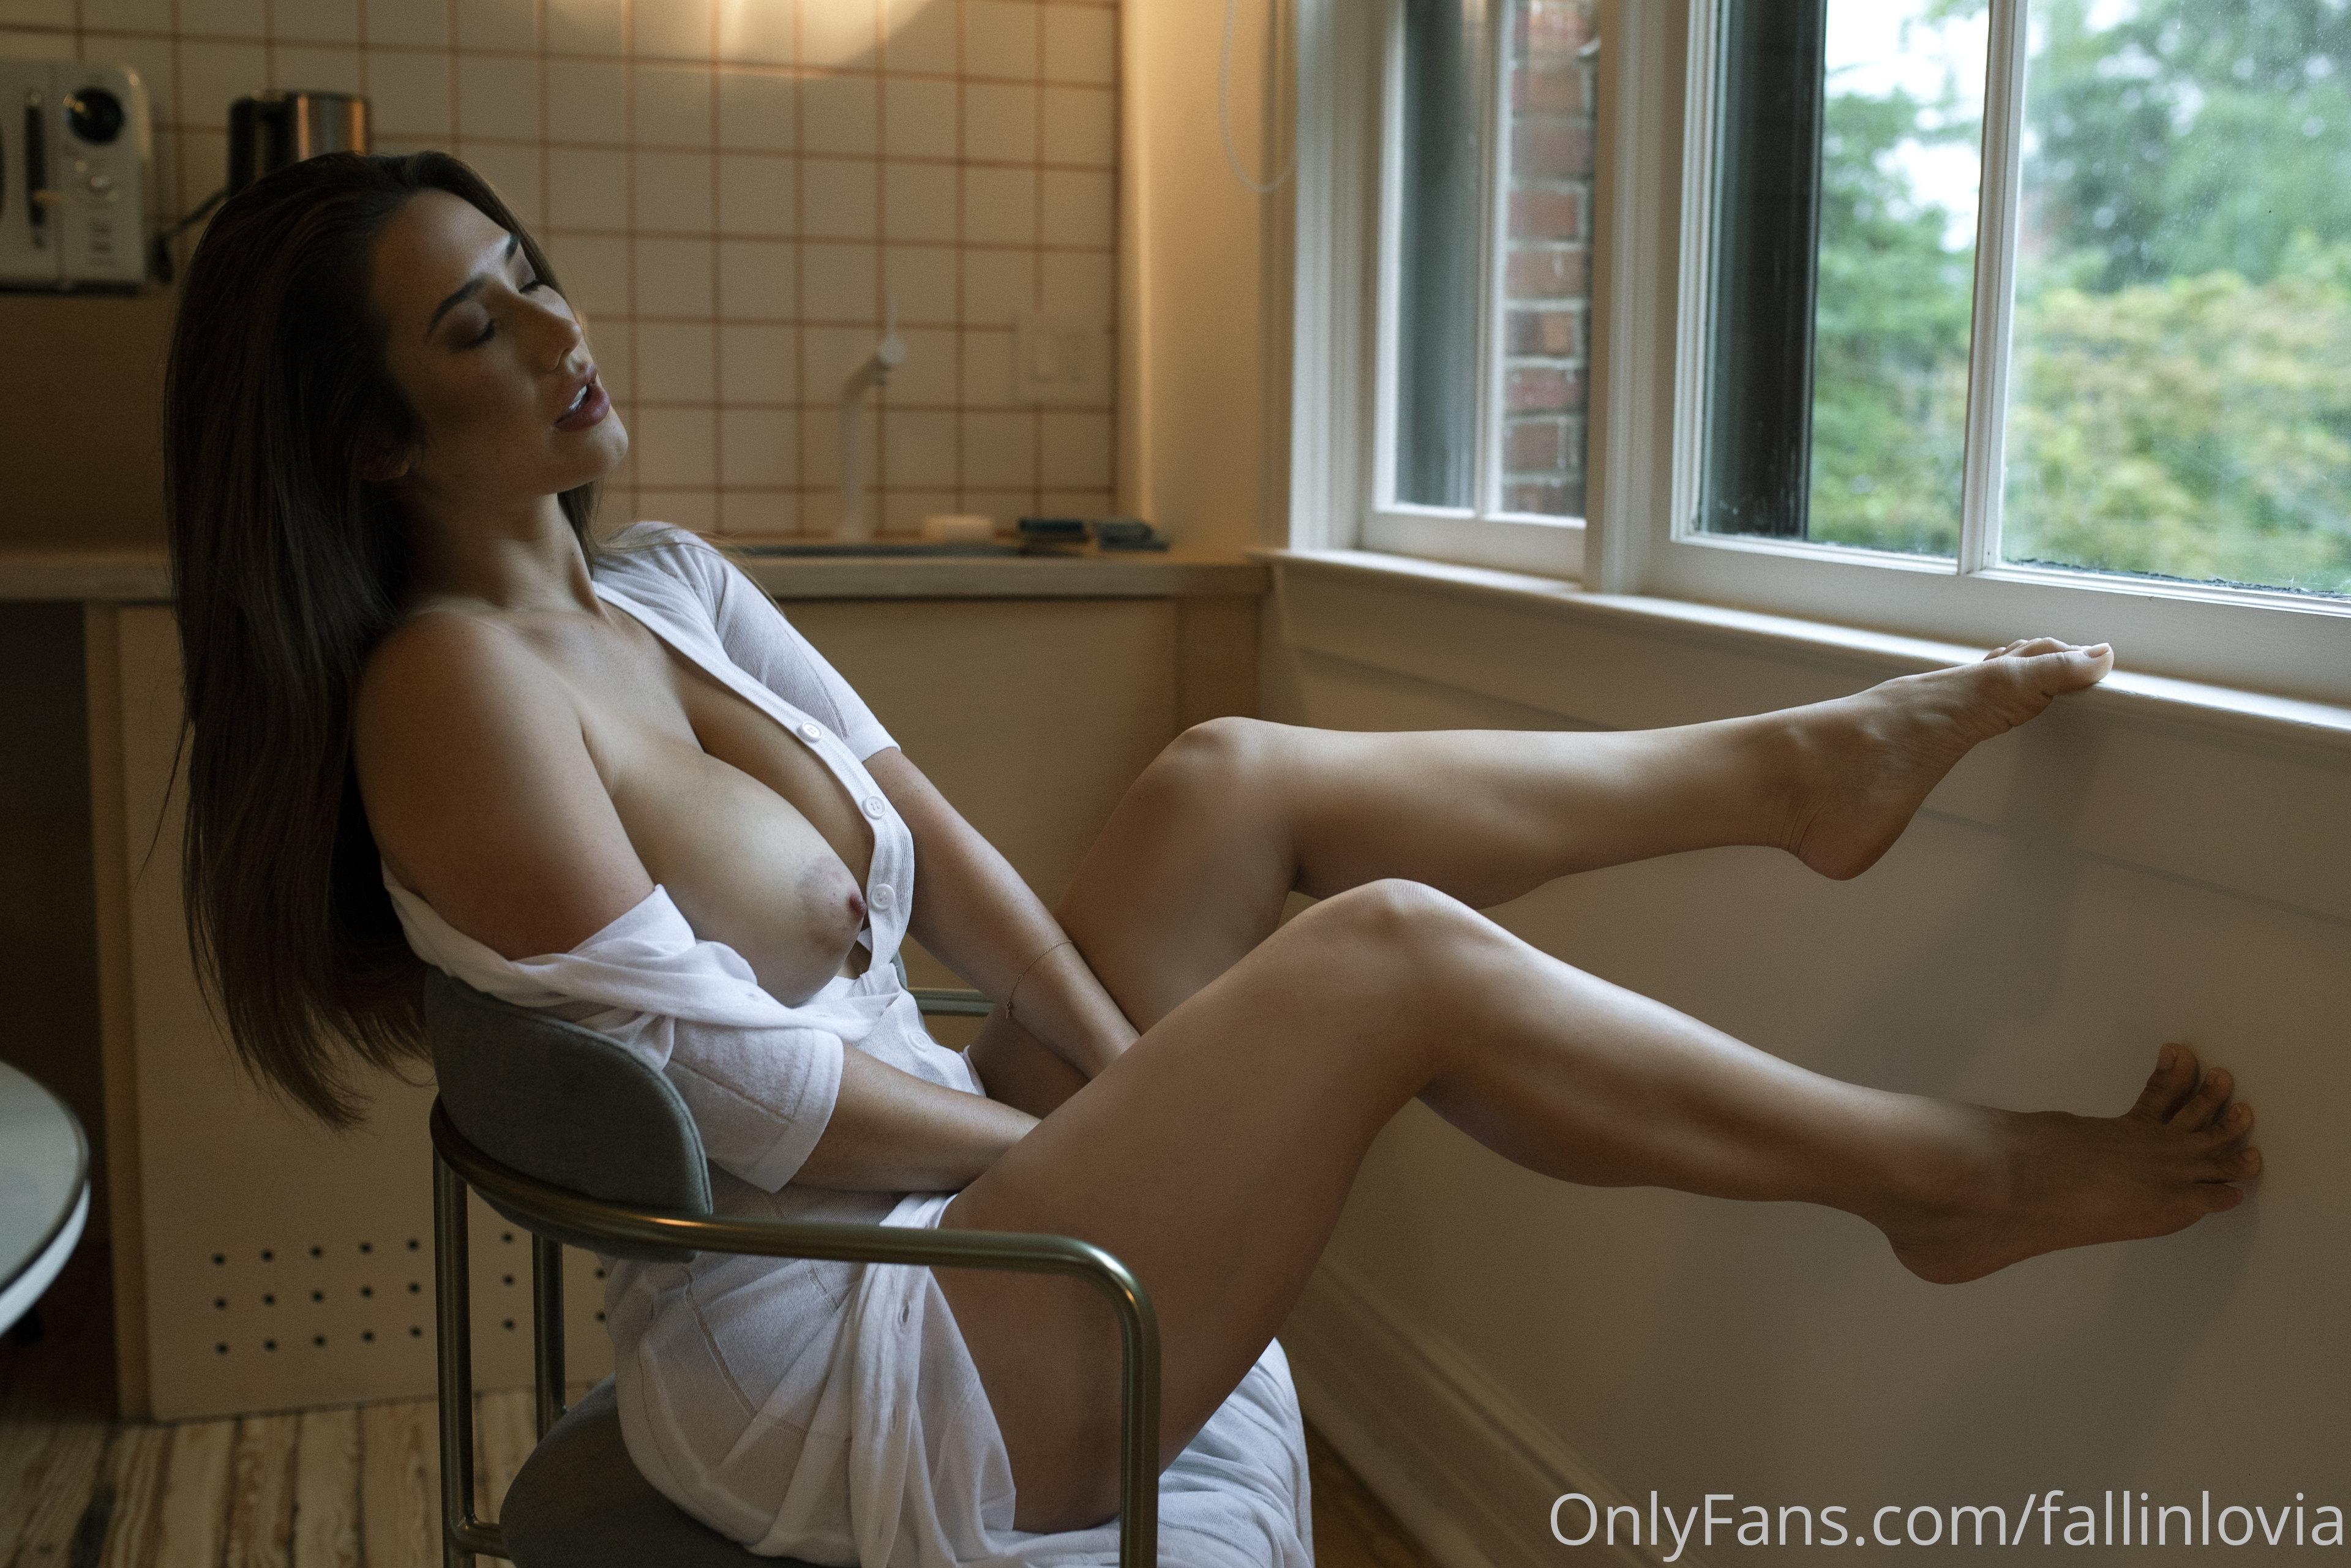 Eva Lovia, Fallinlovia, Onlyfans 0206